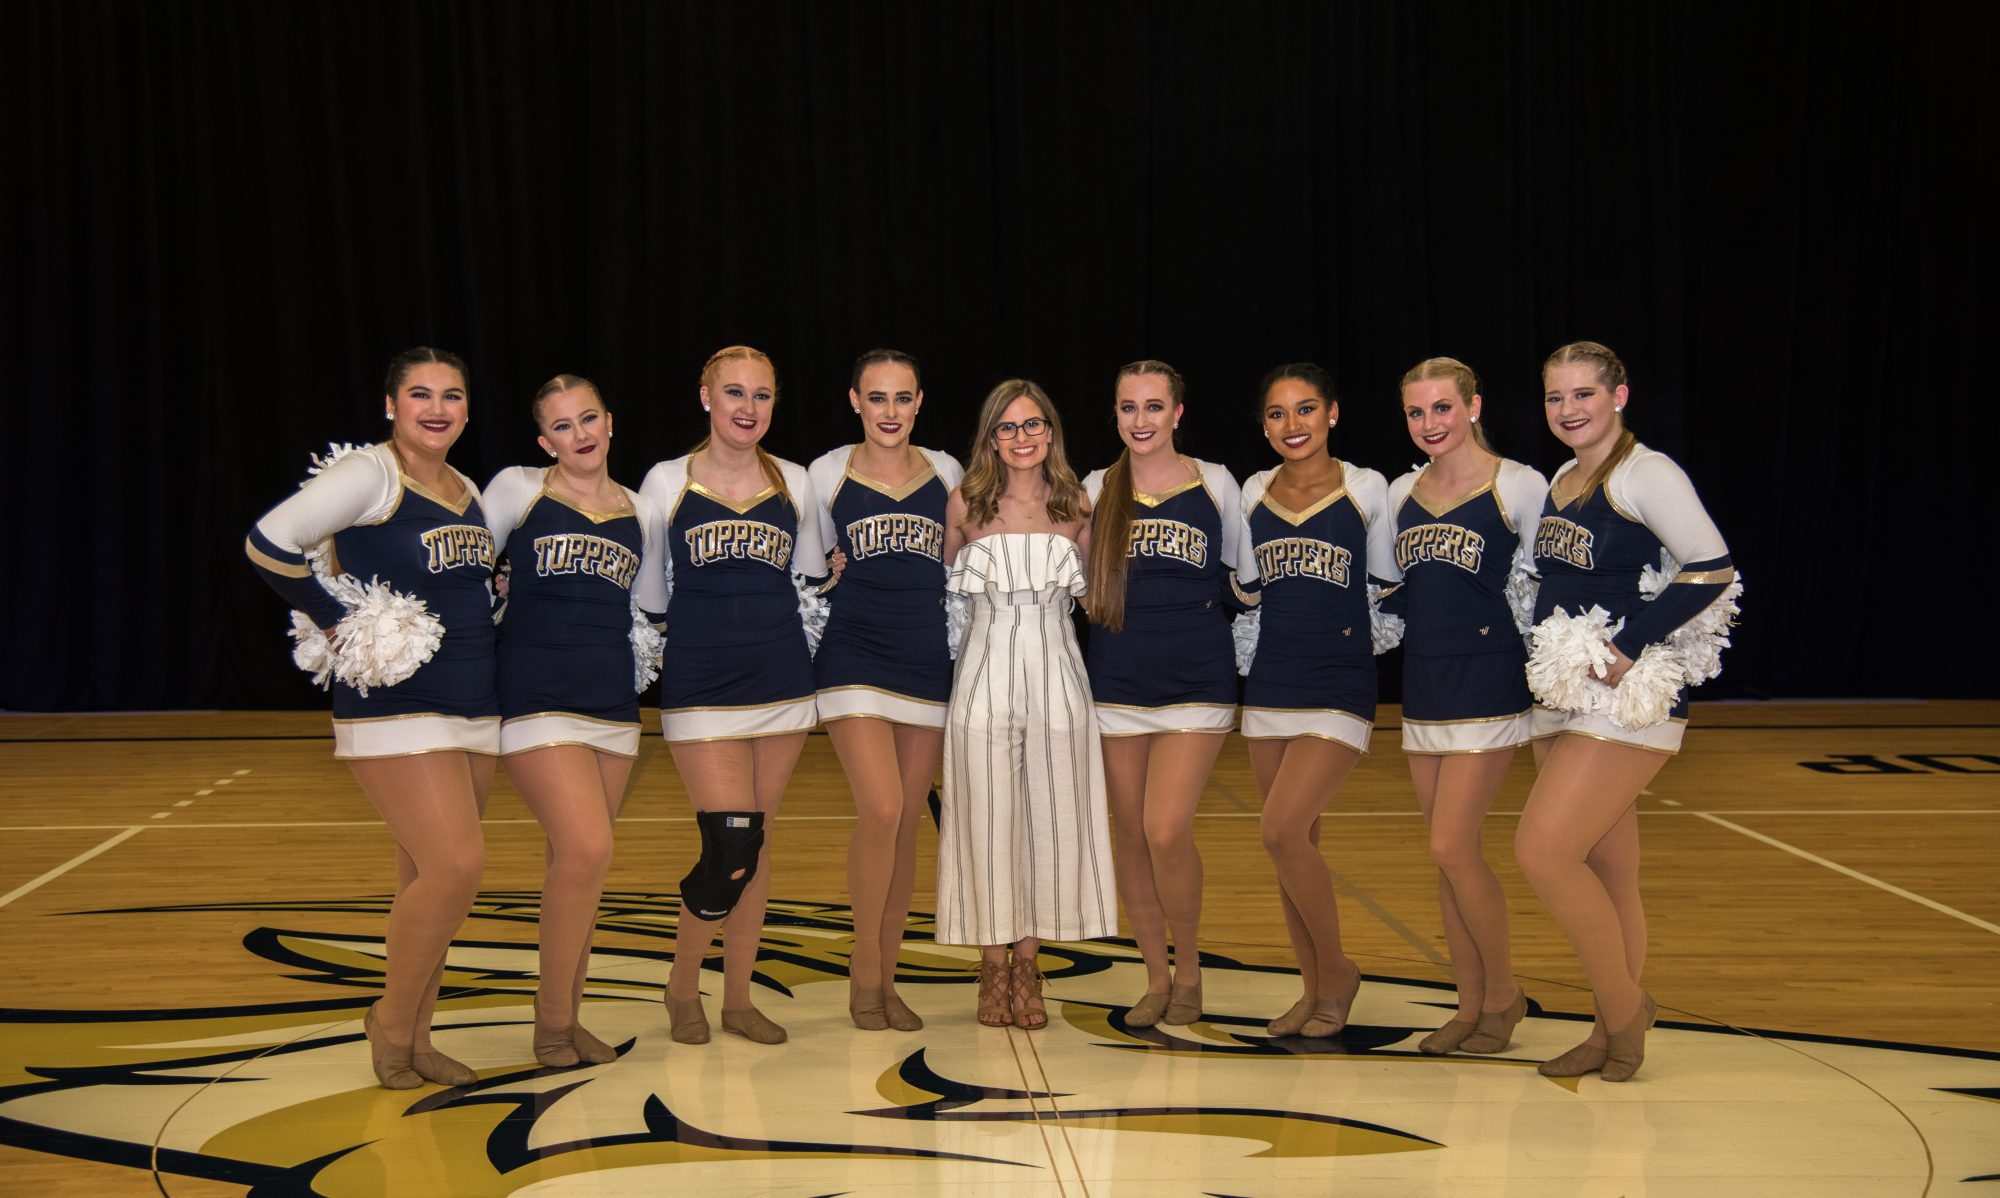 St. Edward's University Topperettes Dance Team